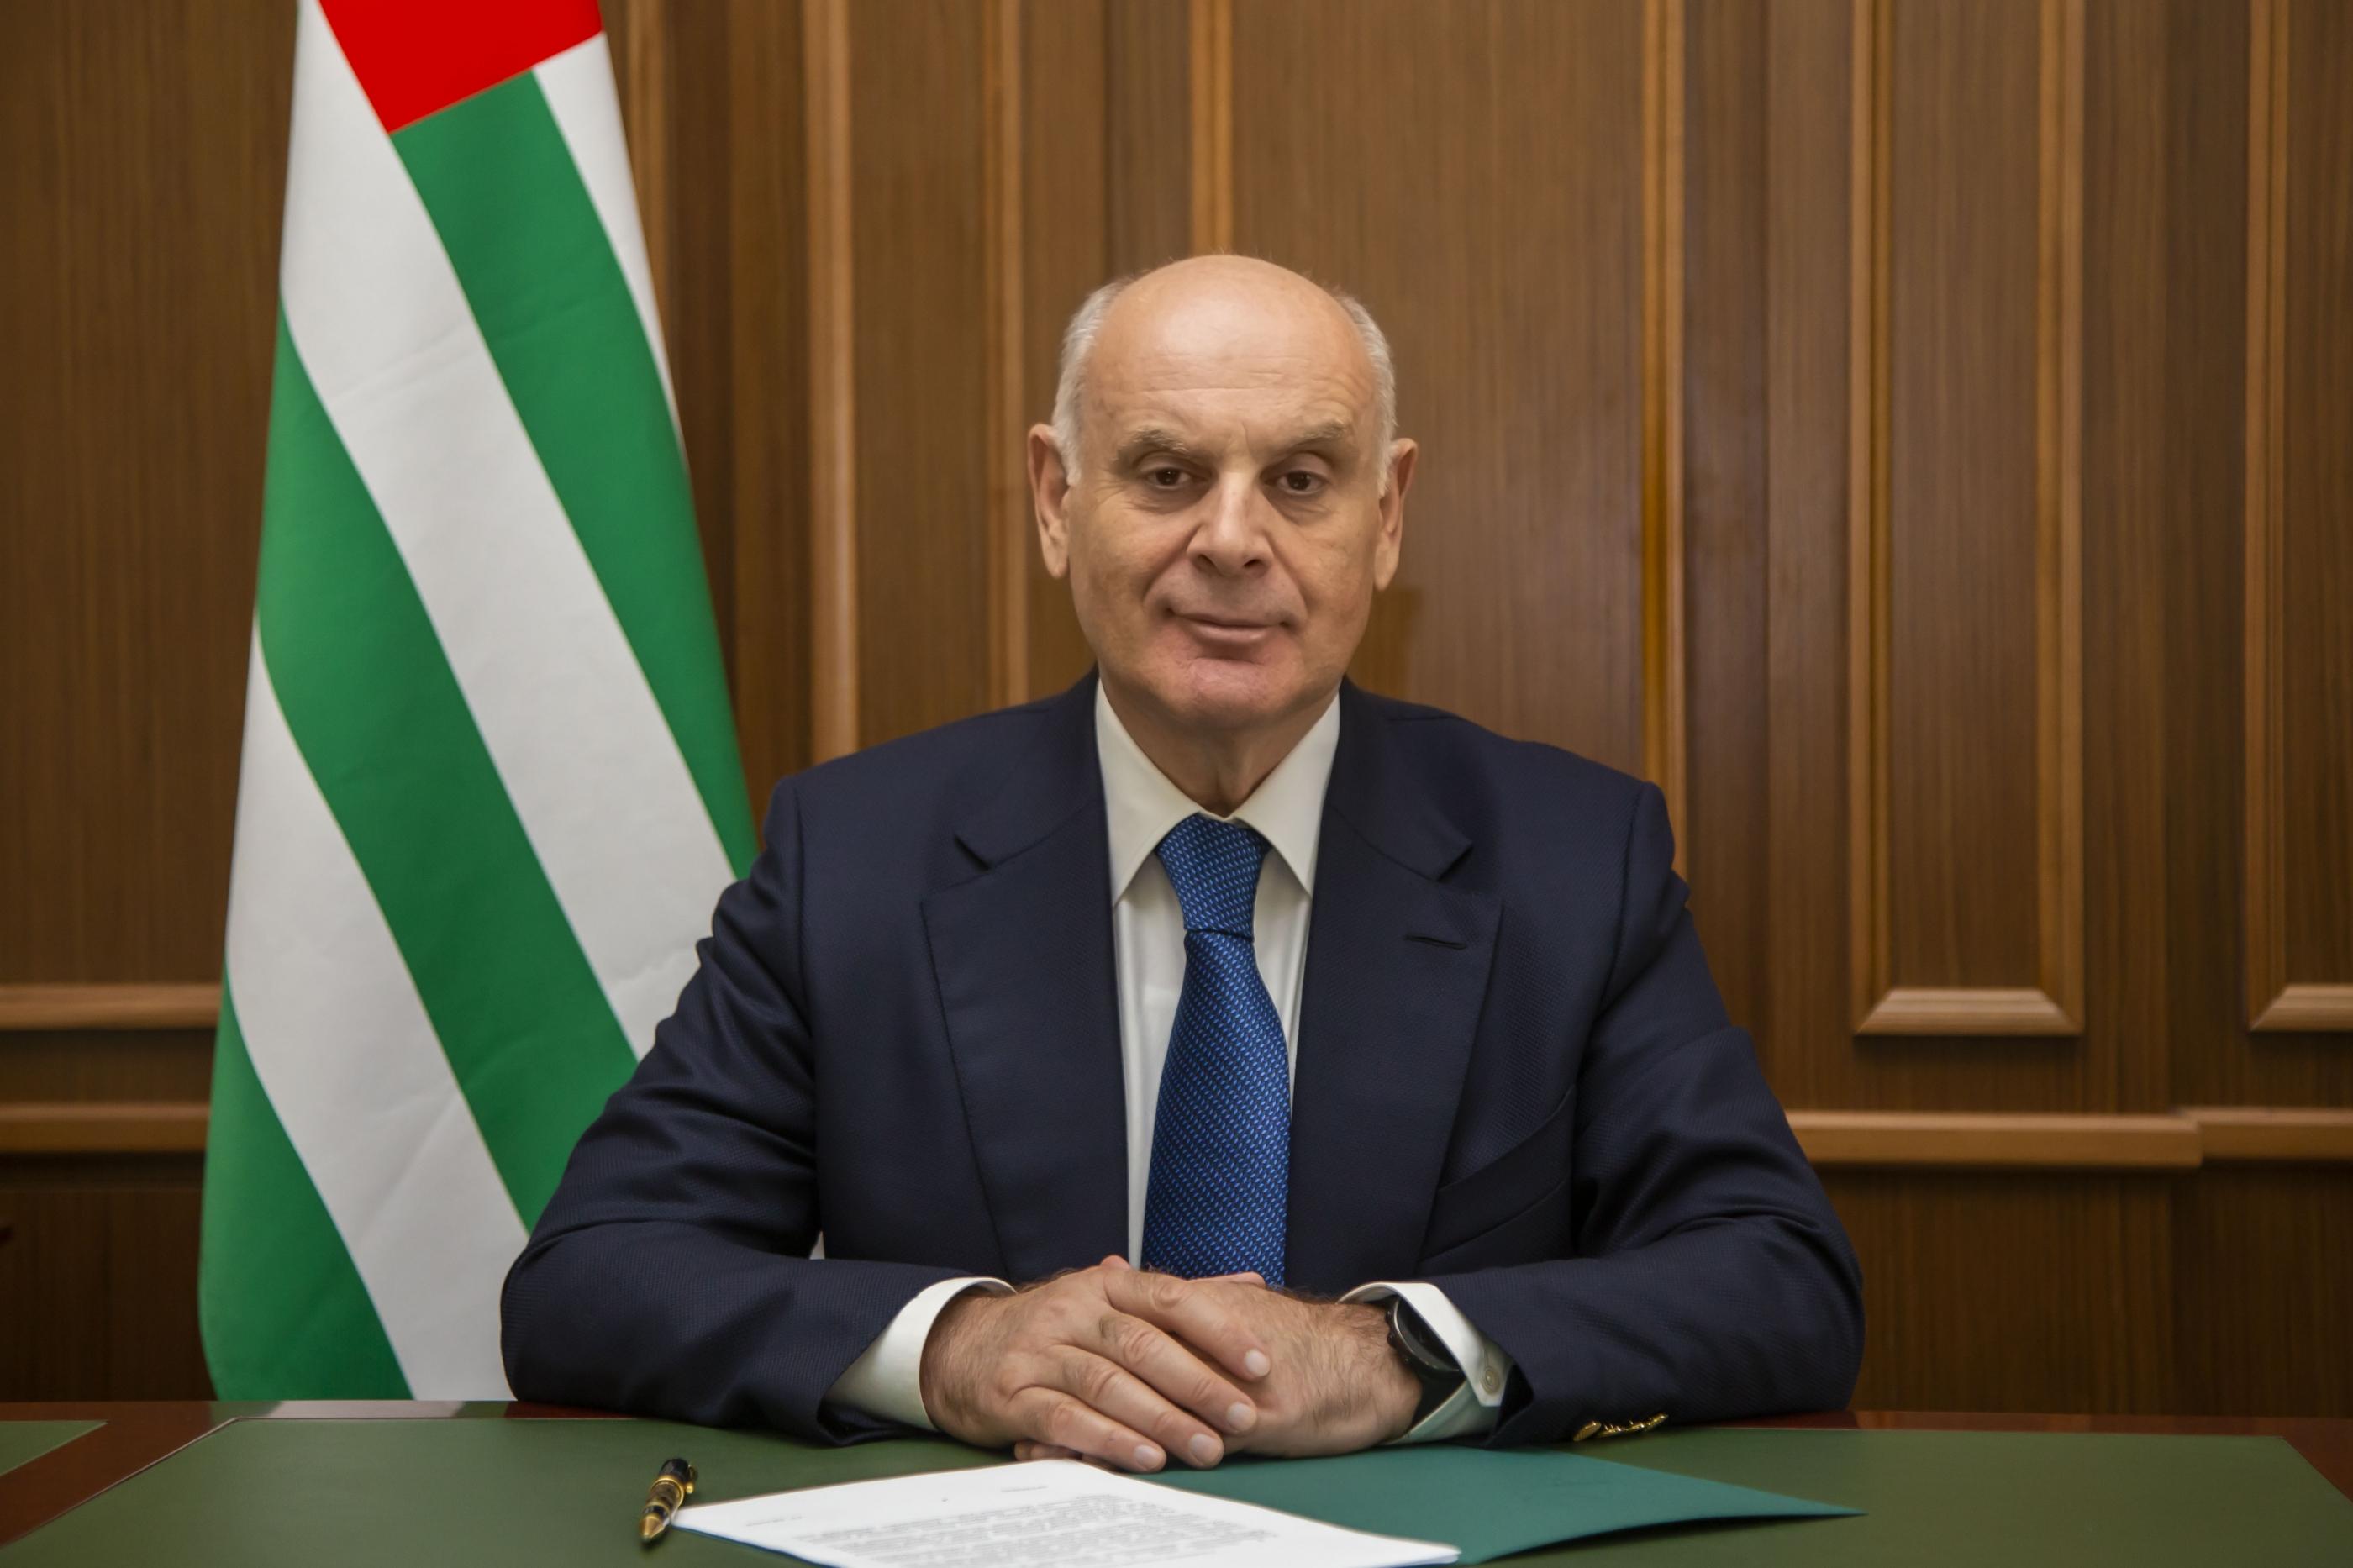 Президент Абхазии поздравил ГТК с 30-летием со дня основания